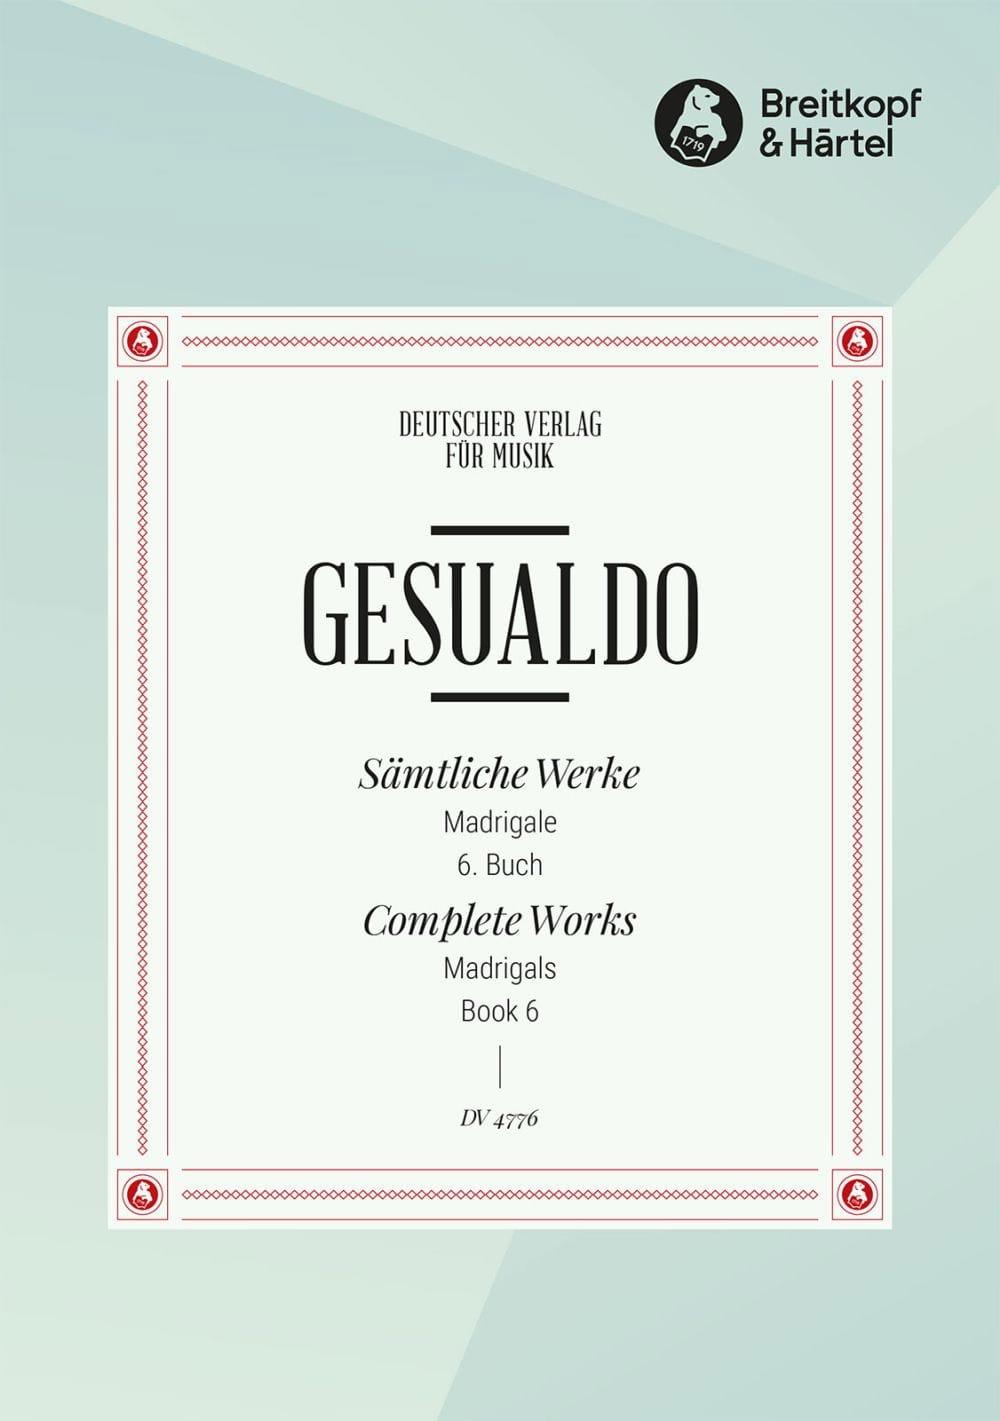 Madrigaux Livre 6 - di Venosa, Carlo Gesualdo - laflutedepan.com